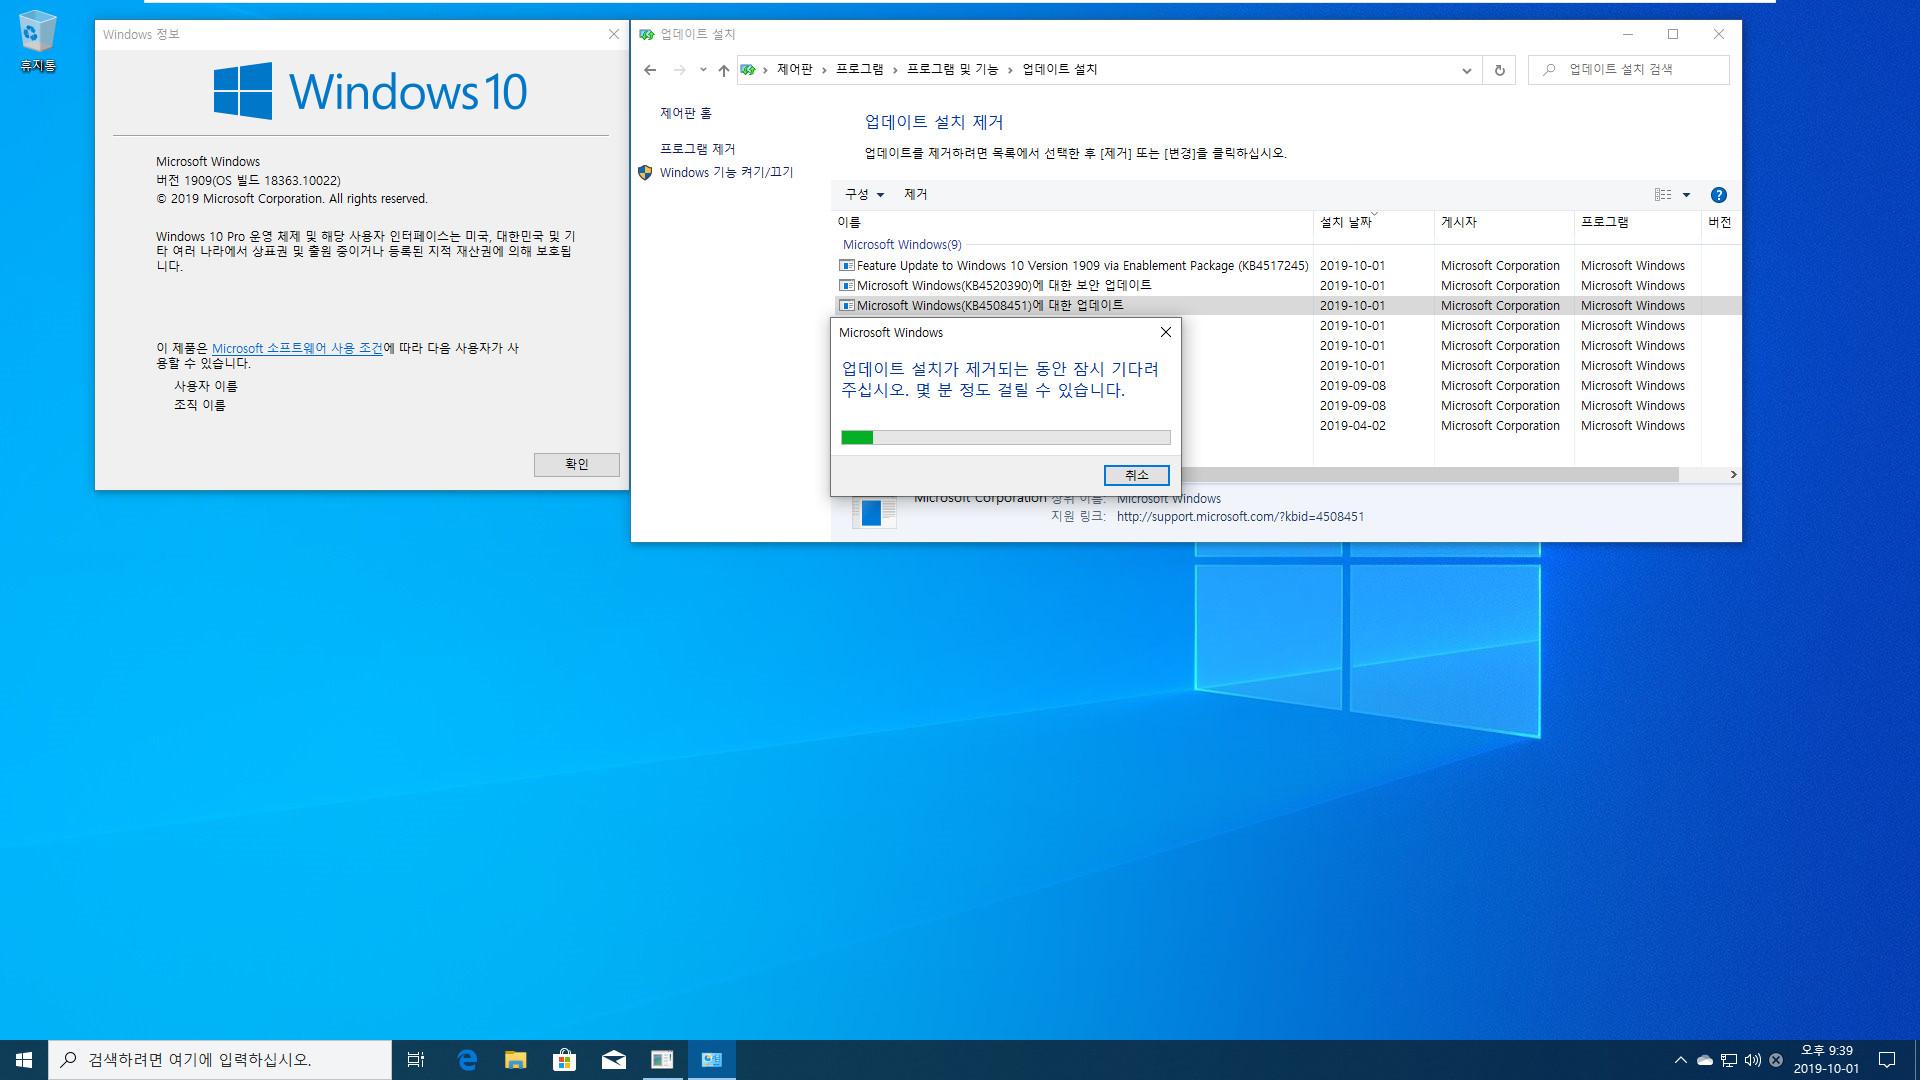 Windows 10 버전 1903 (OS빌드 18362.10022)에서 버전 1909 (OS빌드 18363.387) 으로 변경하기 테스트 2019-10-01_213920.jpg